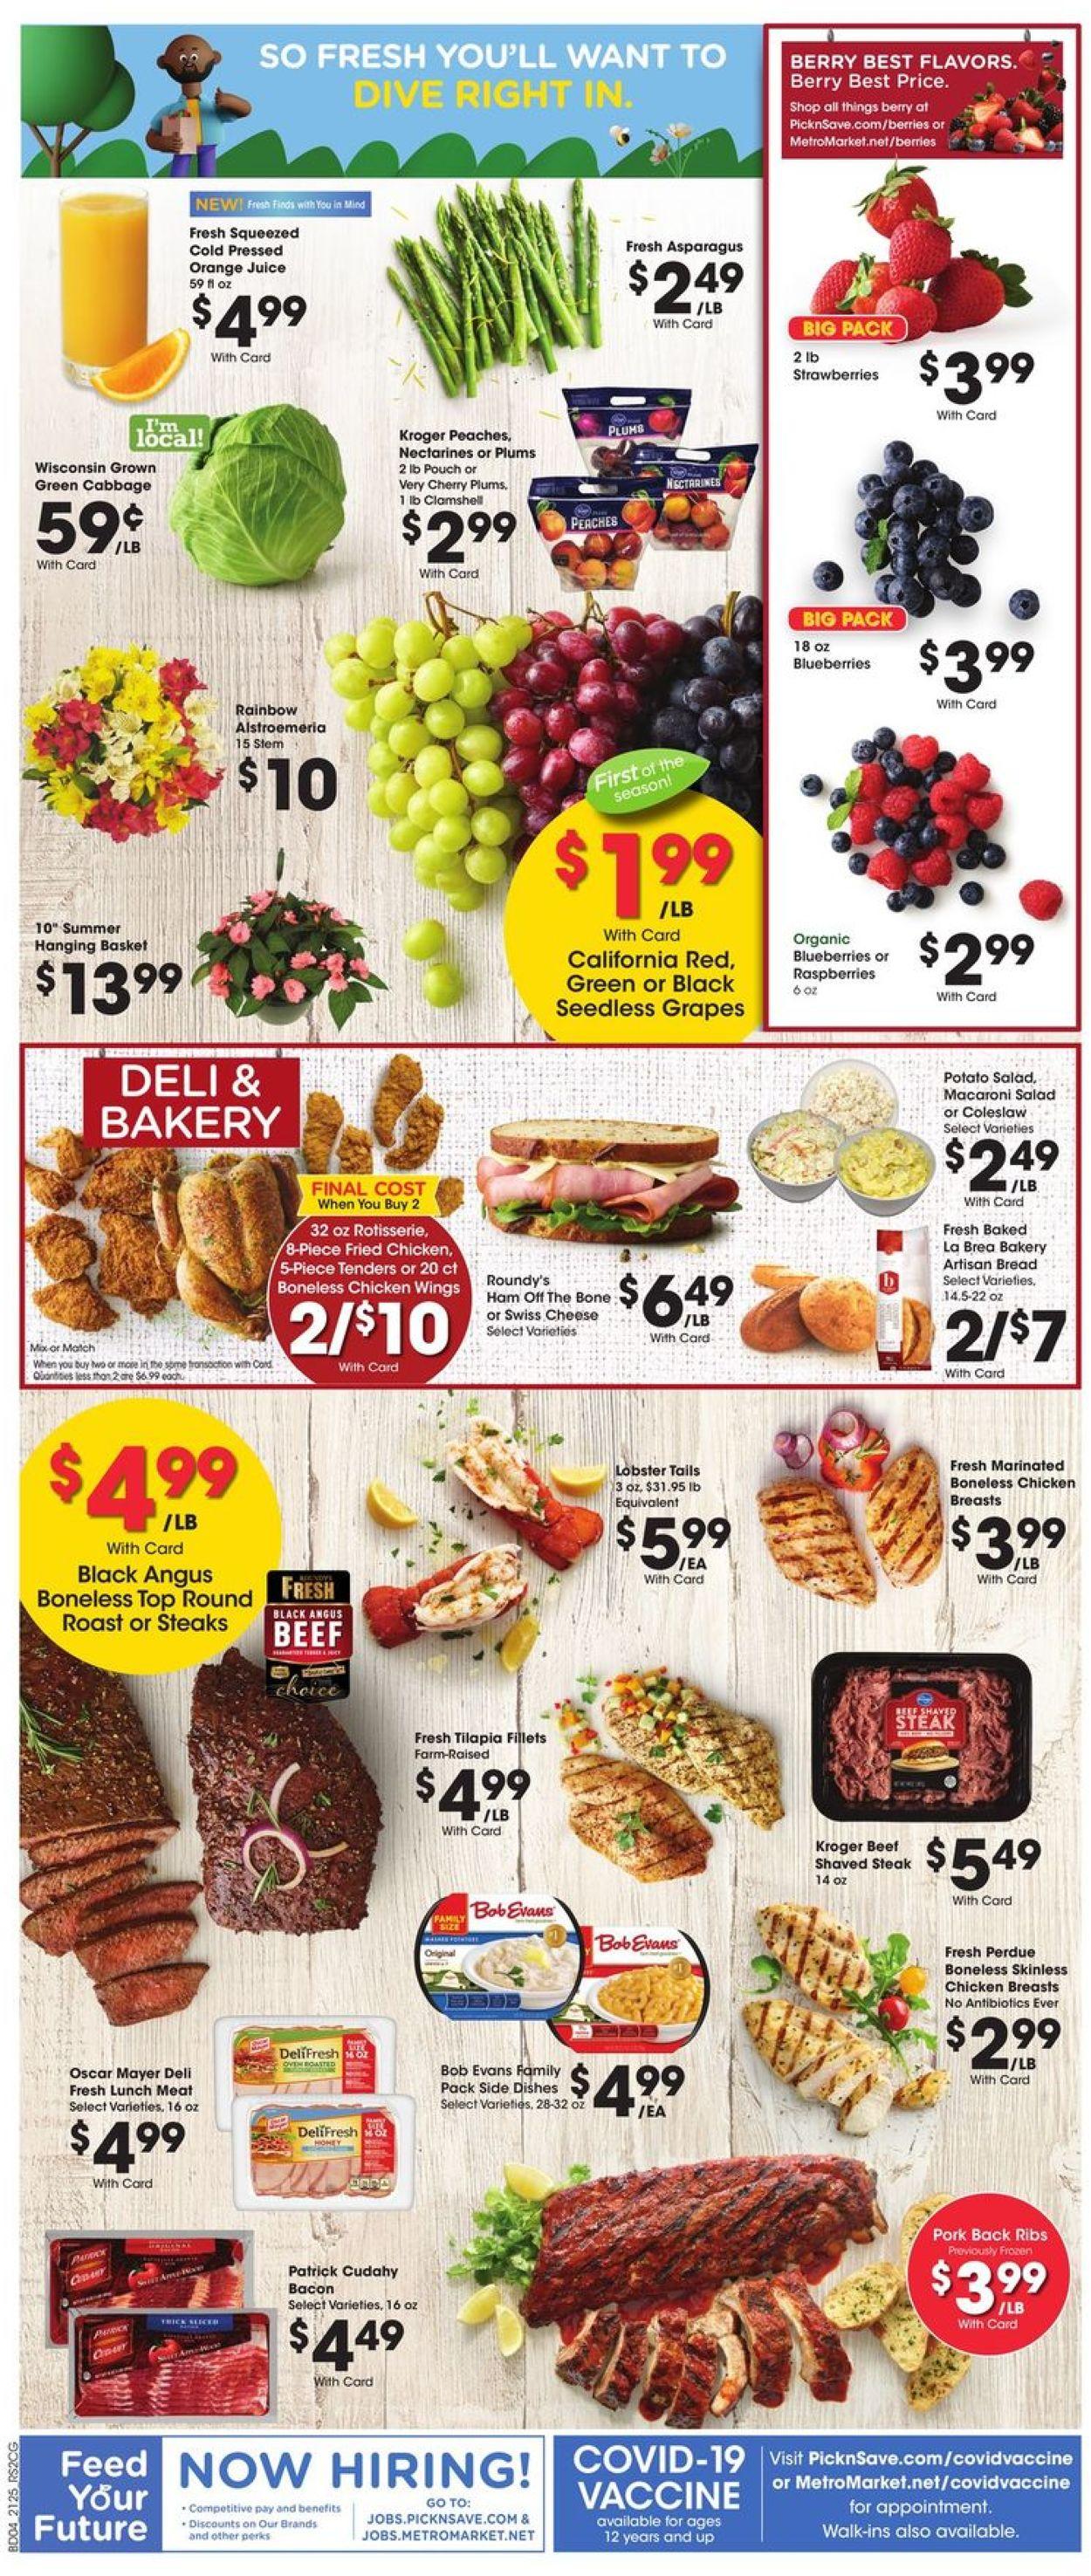 Metro Market Weekly Ad Circular - valid 07/21-07/27/2021 (Page 7)